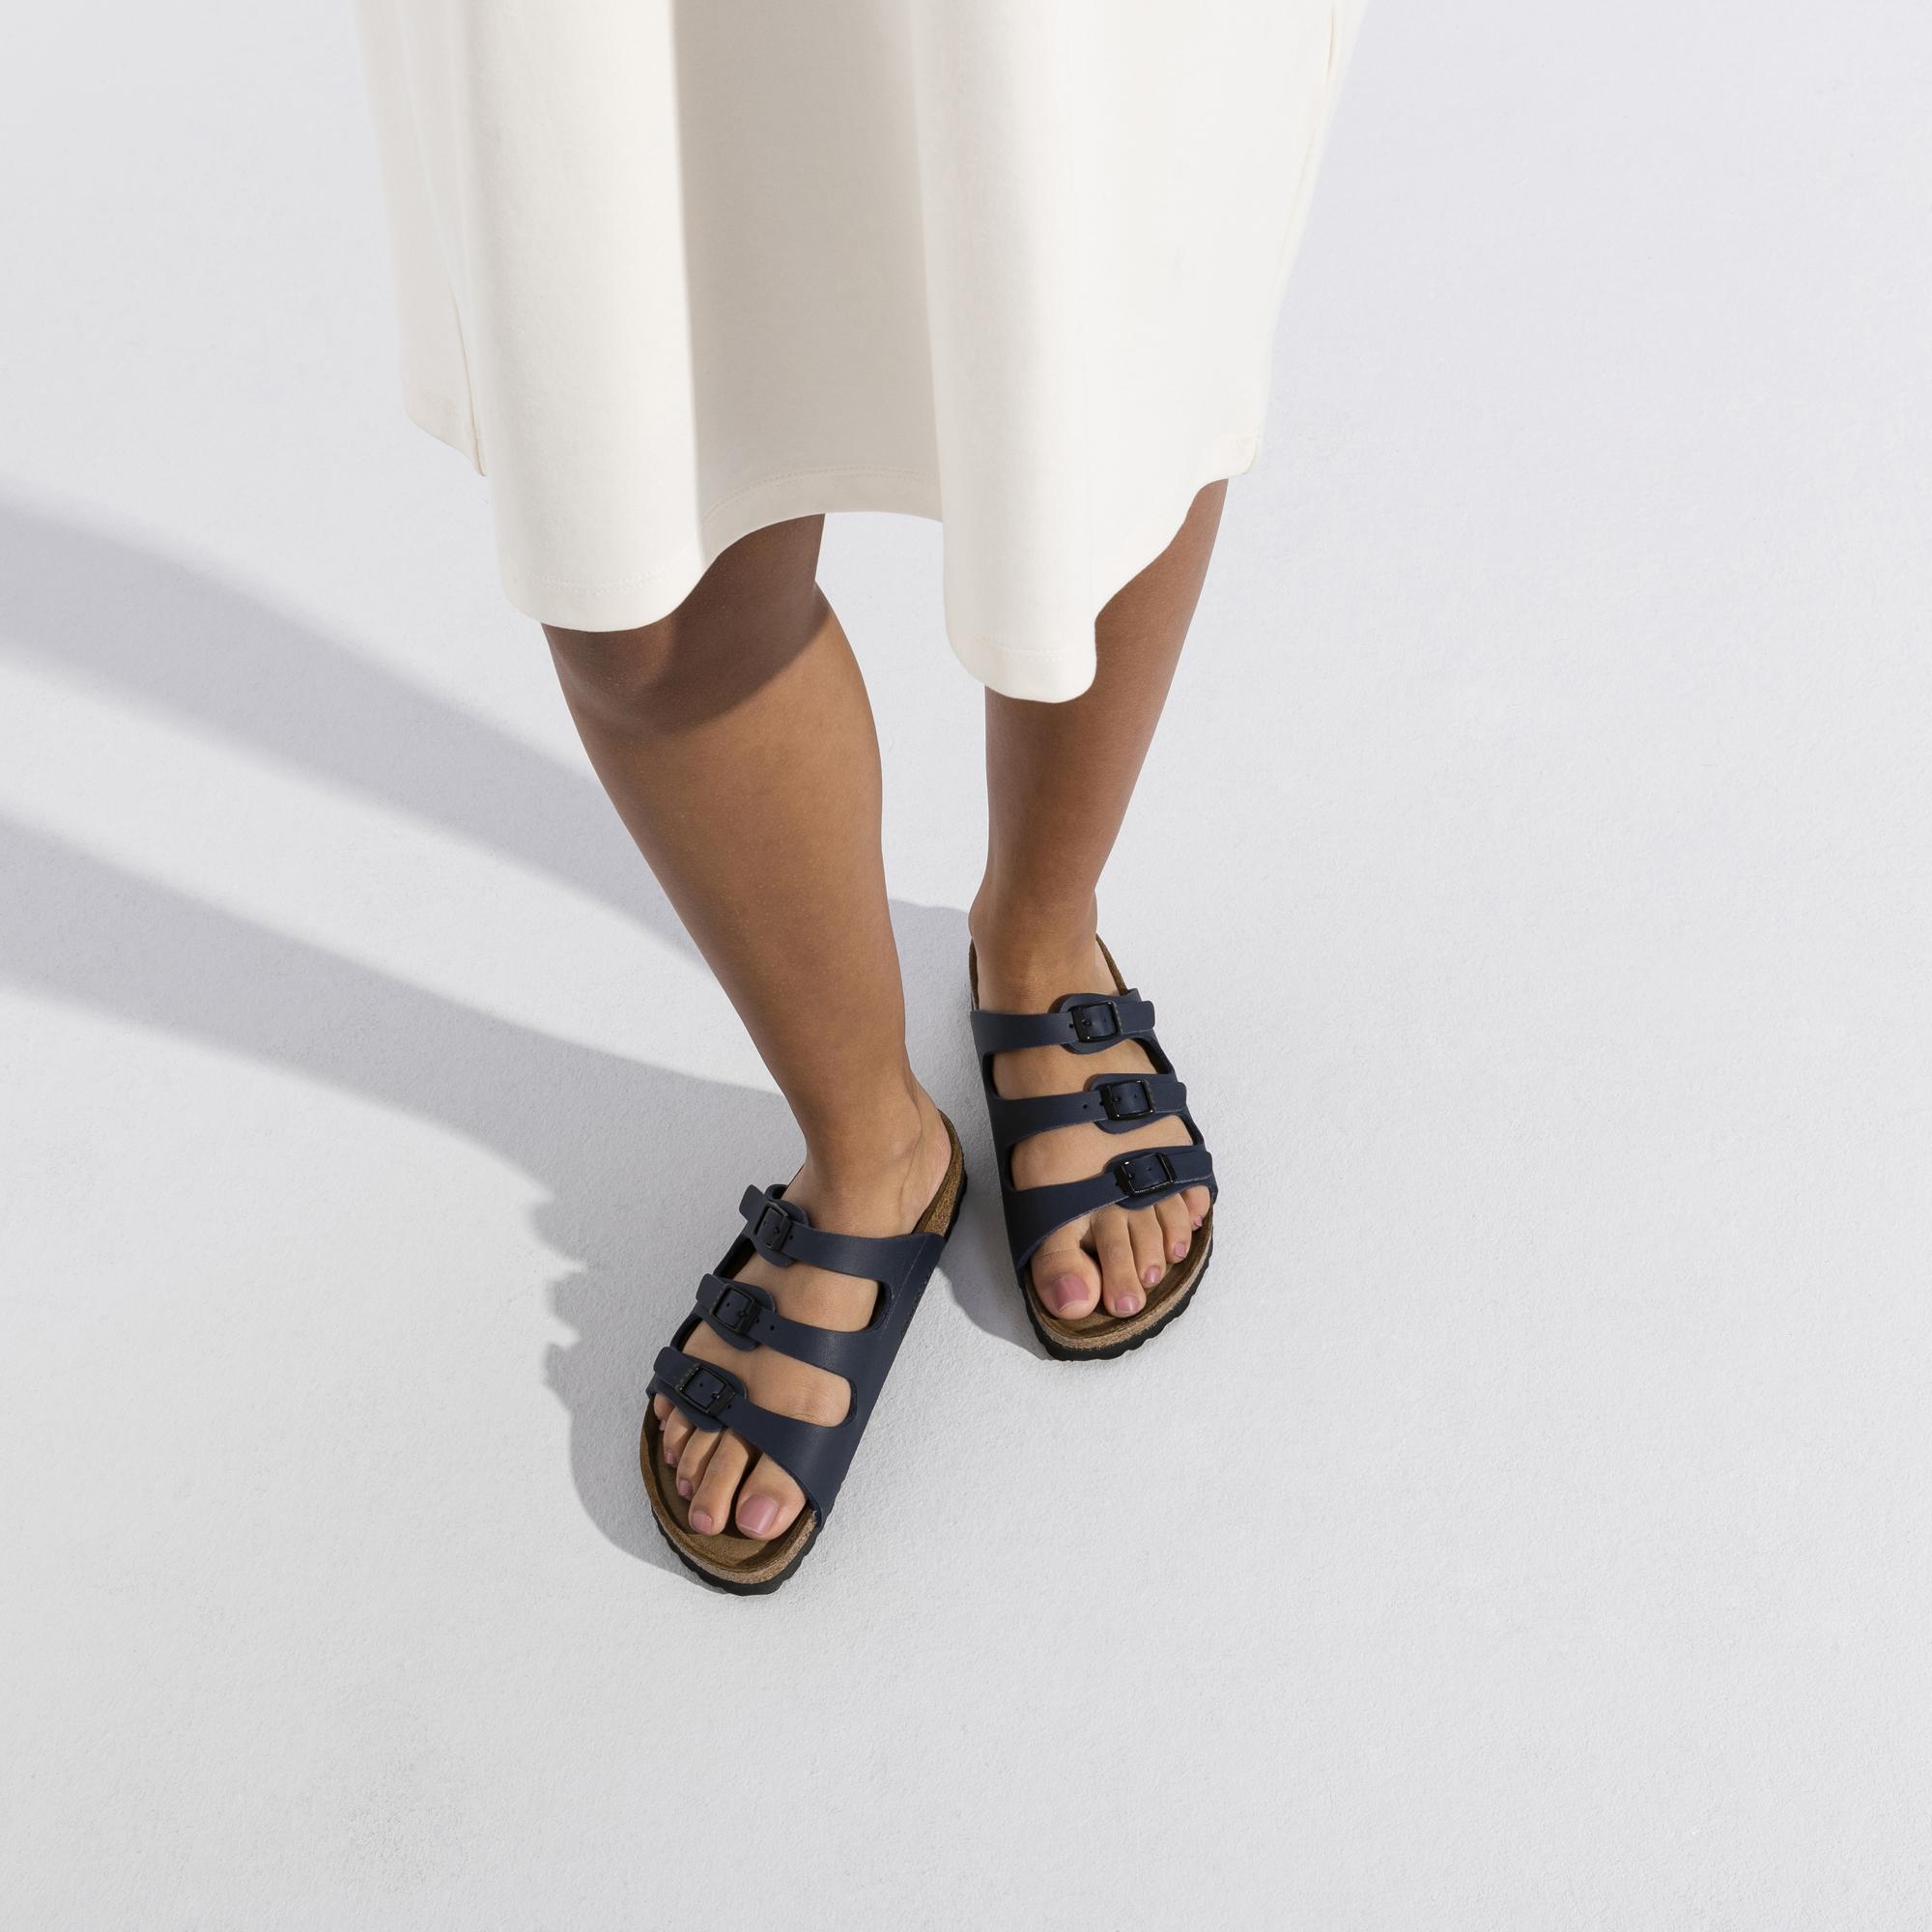 Birkenstock 554713 Florida Blue Soft Footbed Birko Flor Narrow All Sizes Brand New